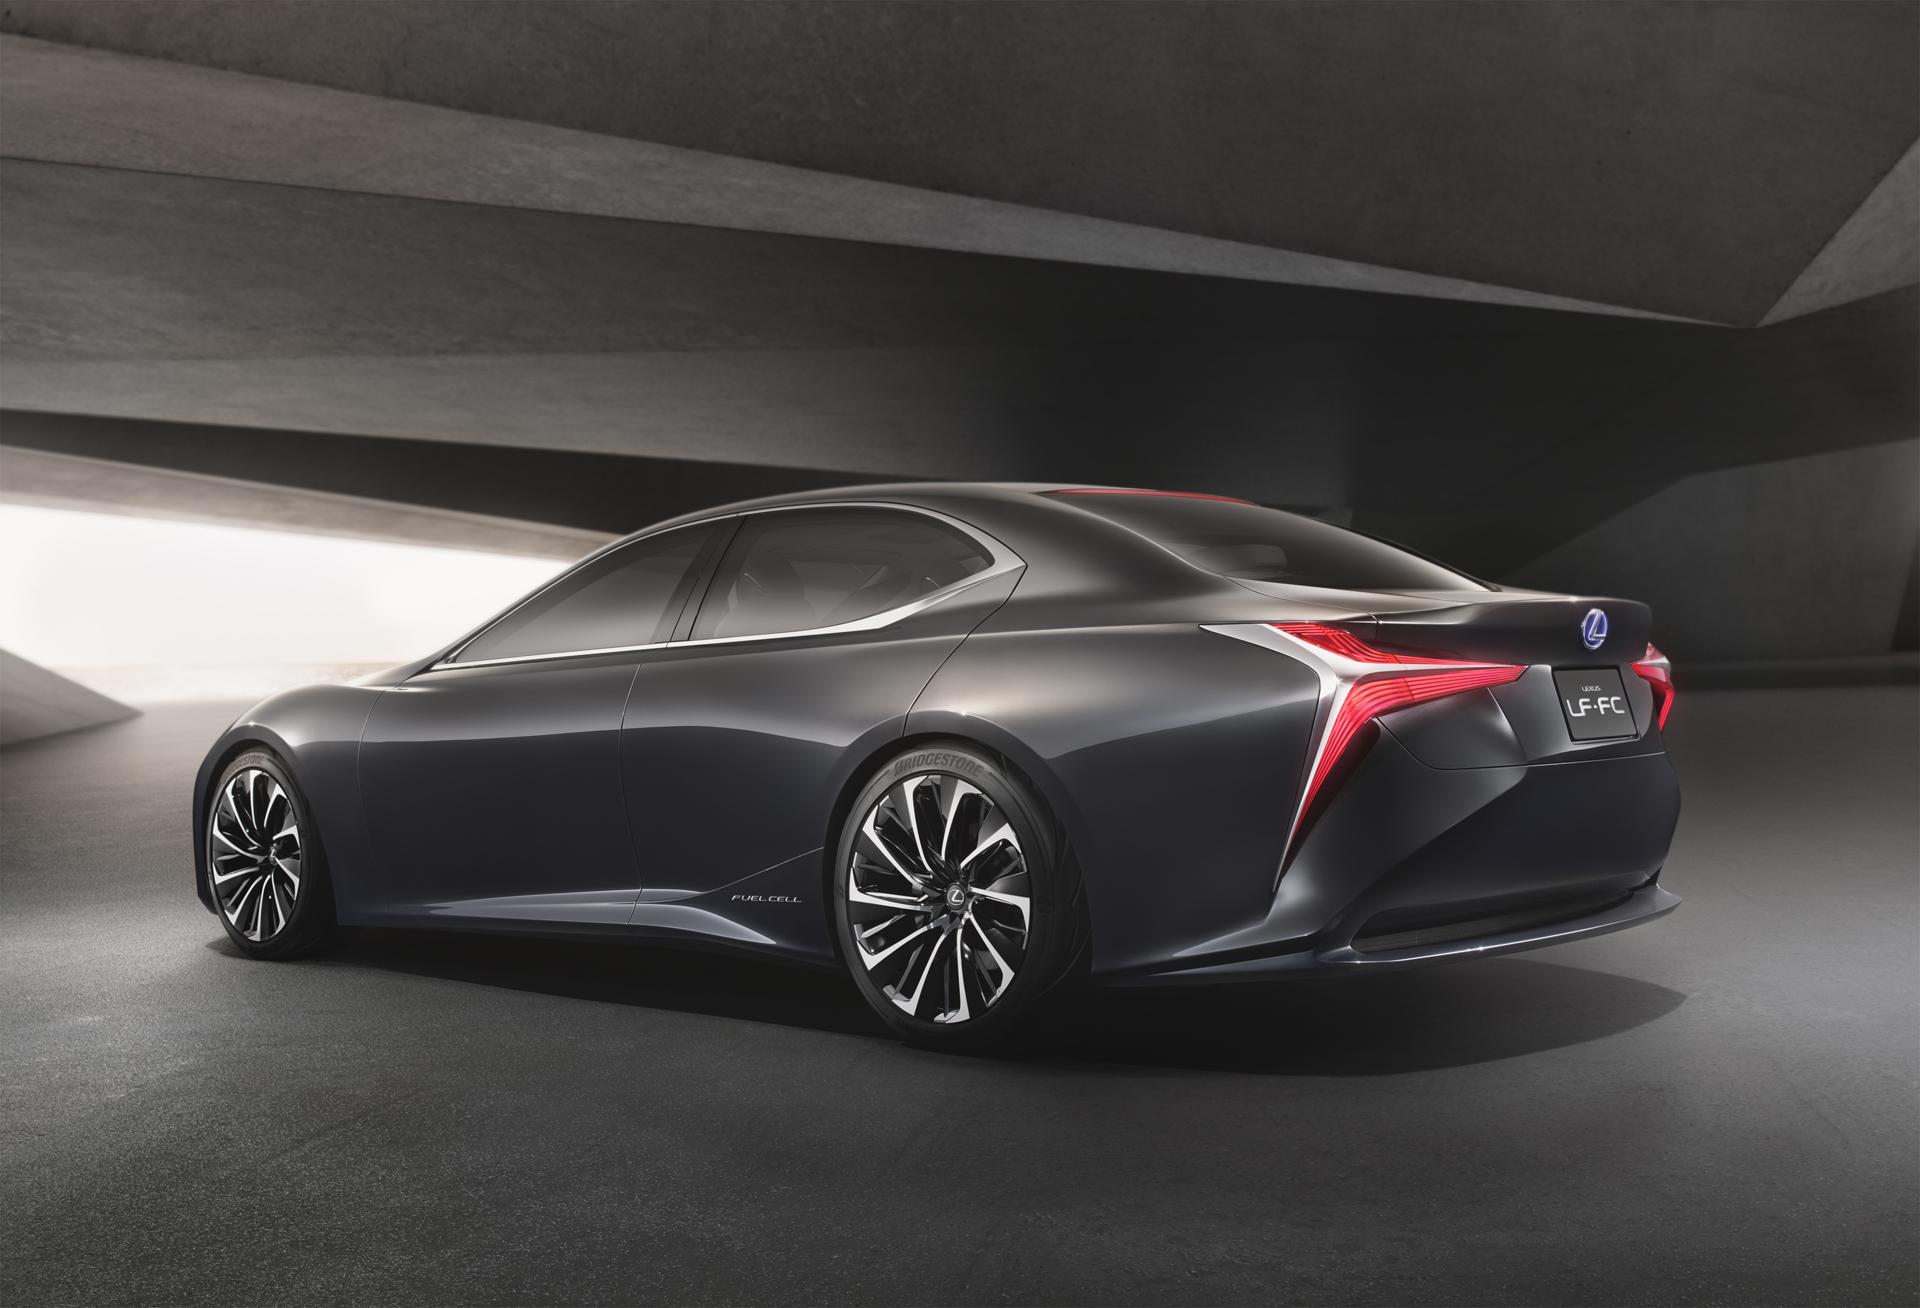 Lexus_LF_FC_Concept_6